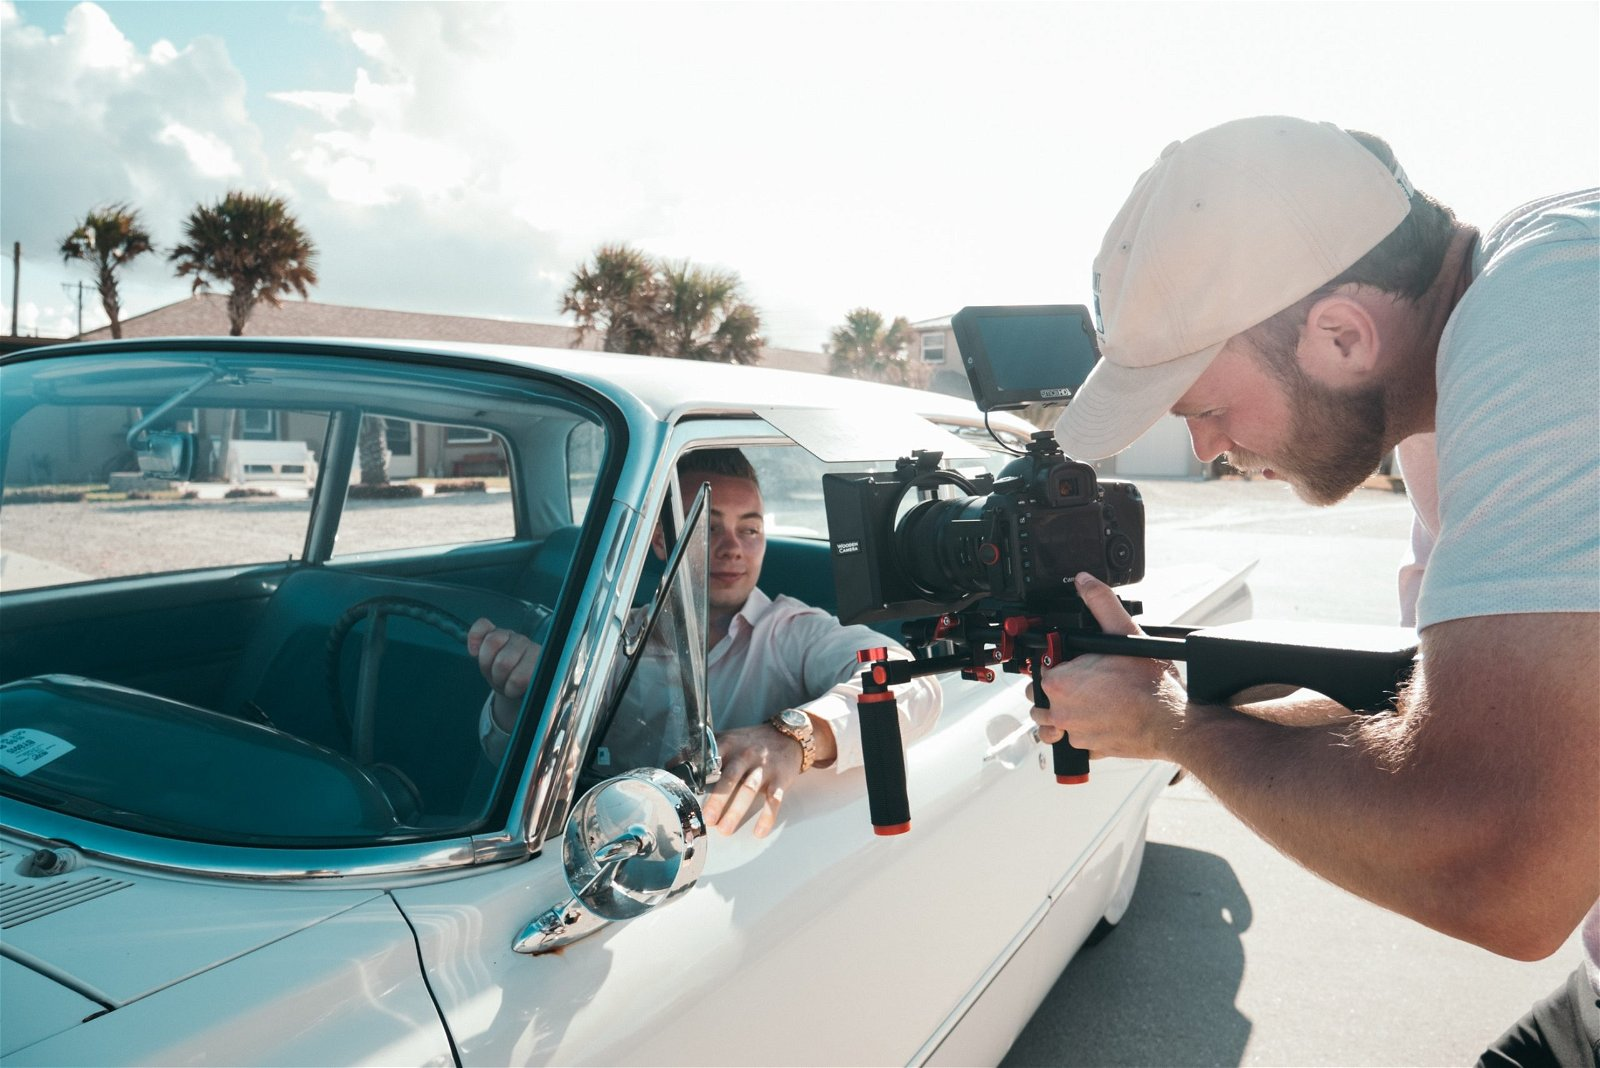 Photographer shooting guy inside a car